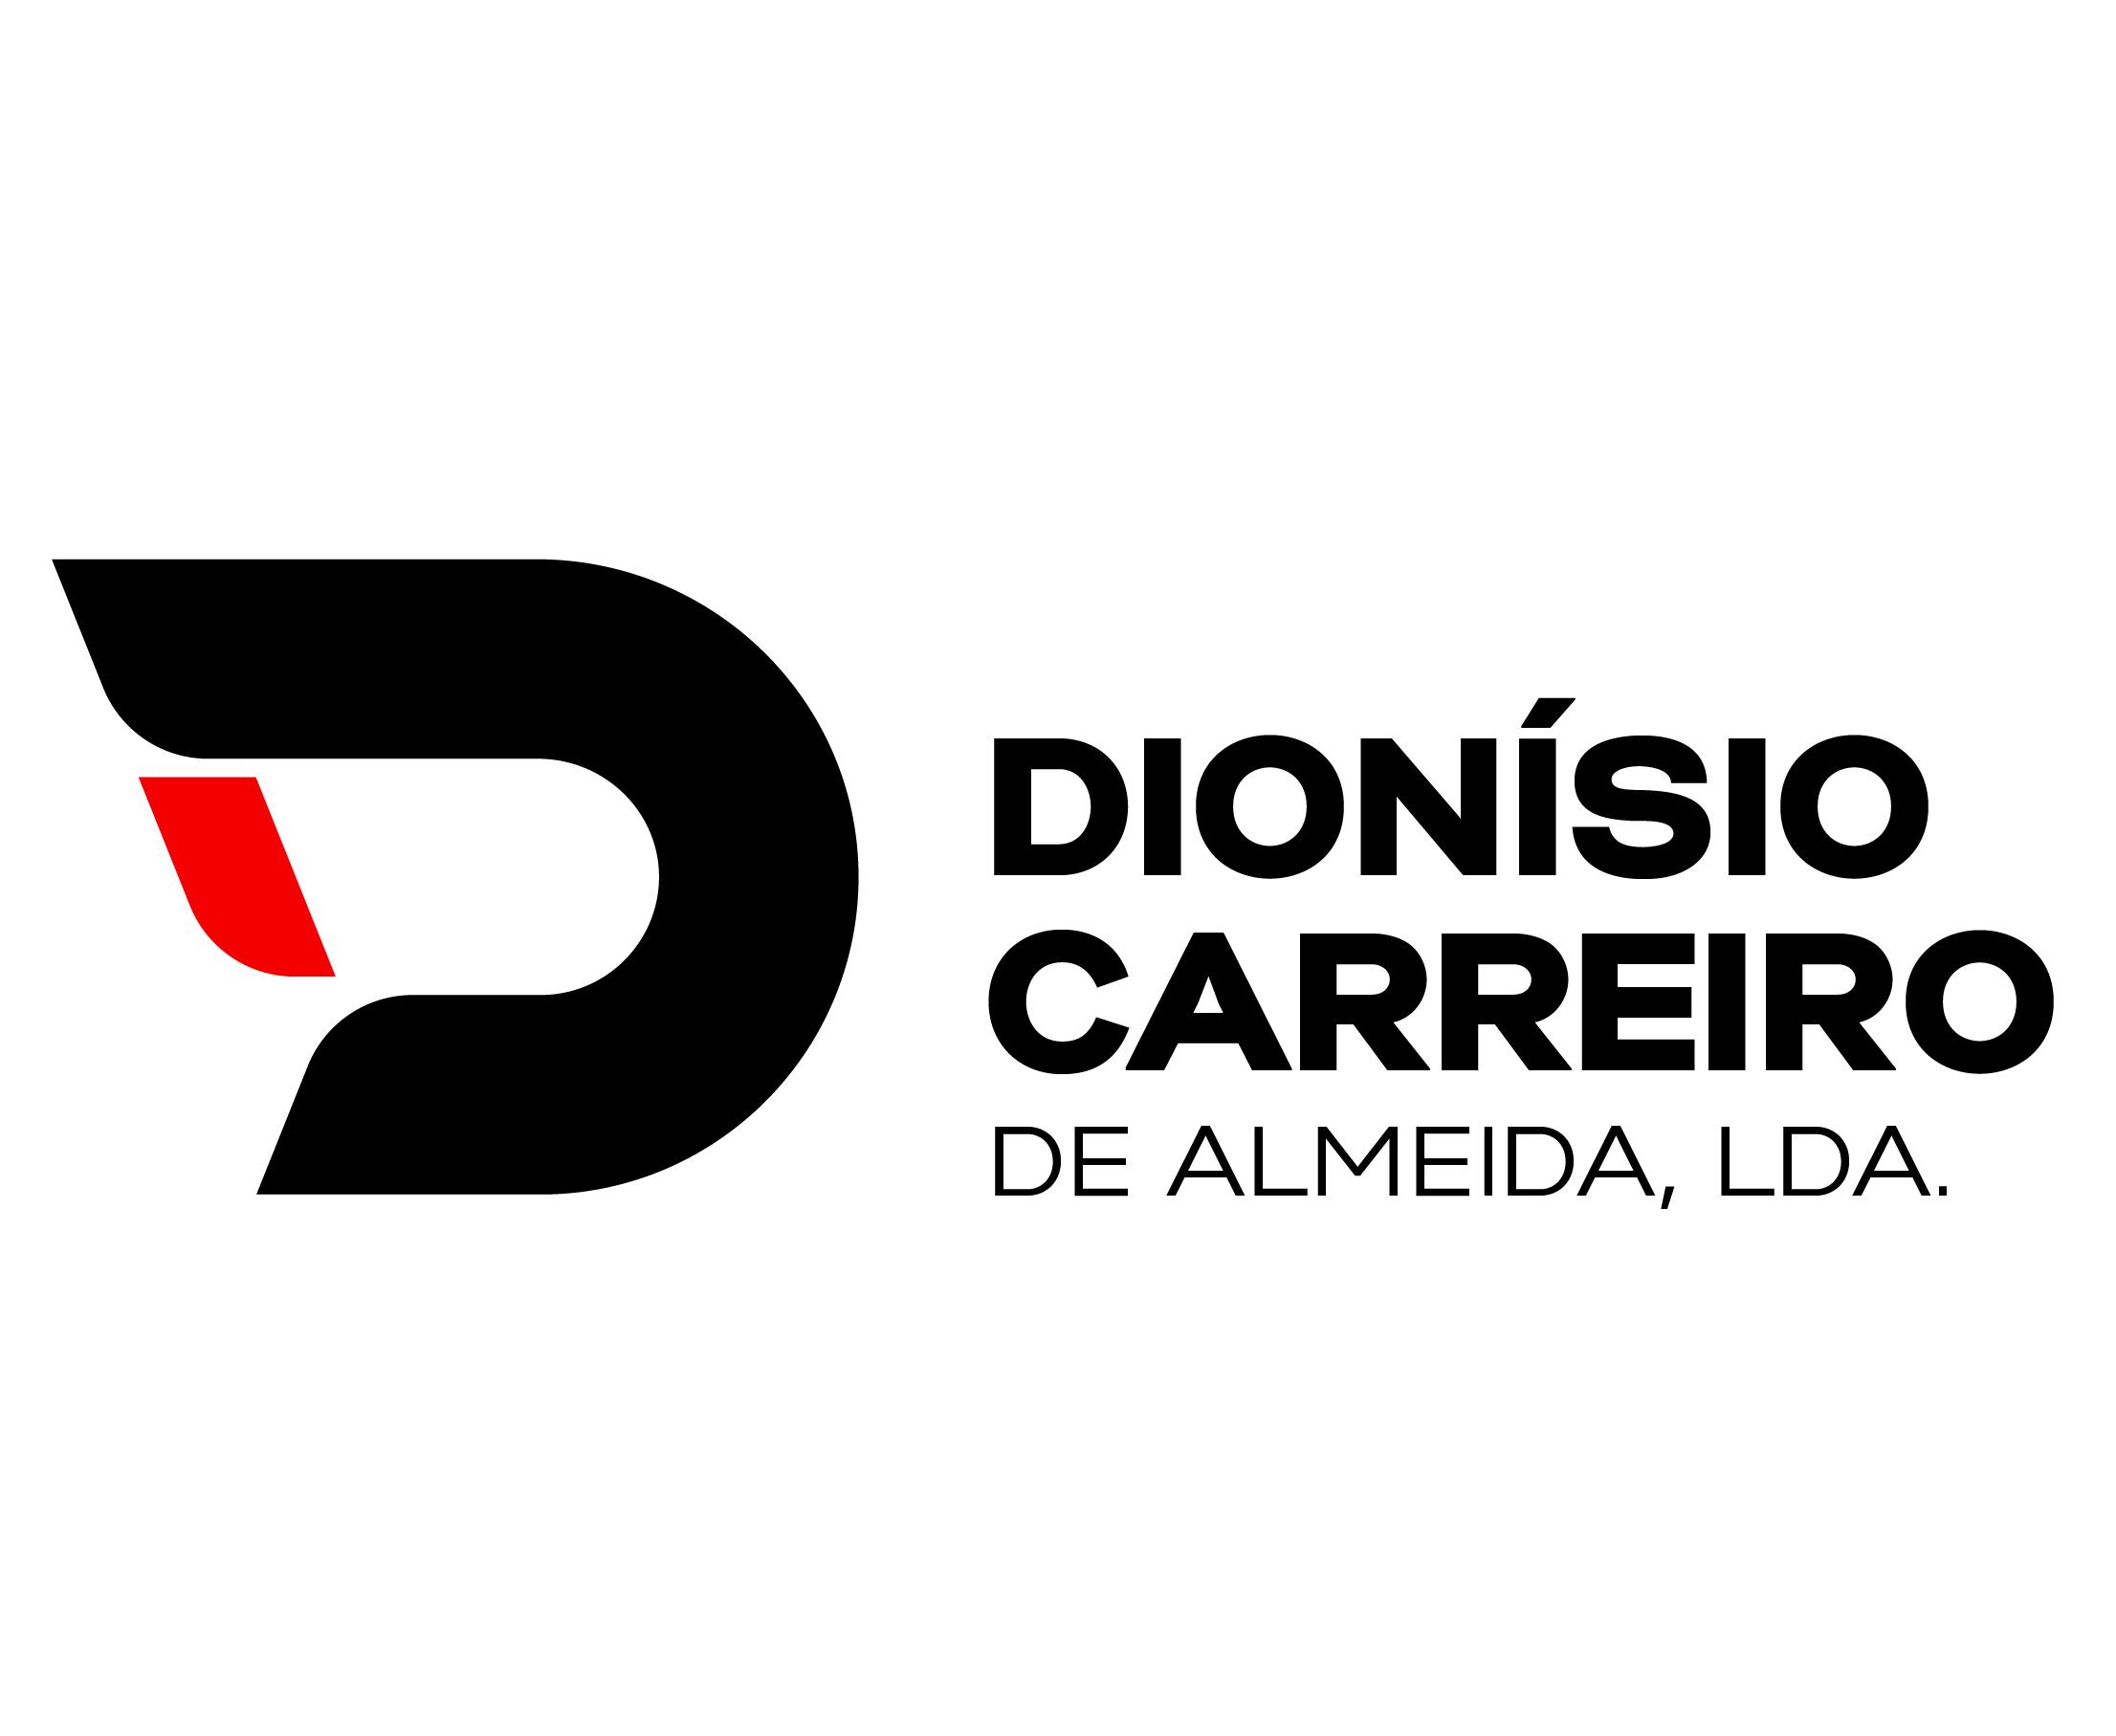 Dionísio Carreiro de Almeida, Lda.